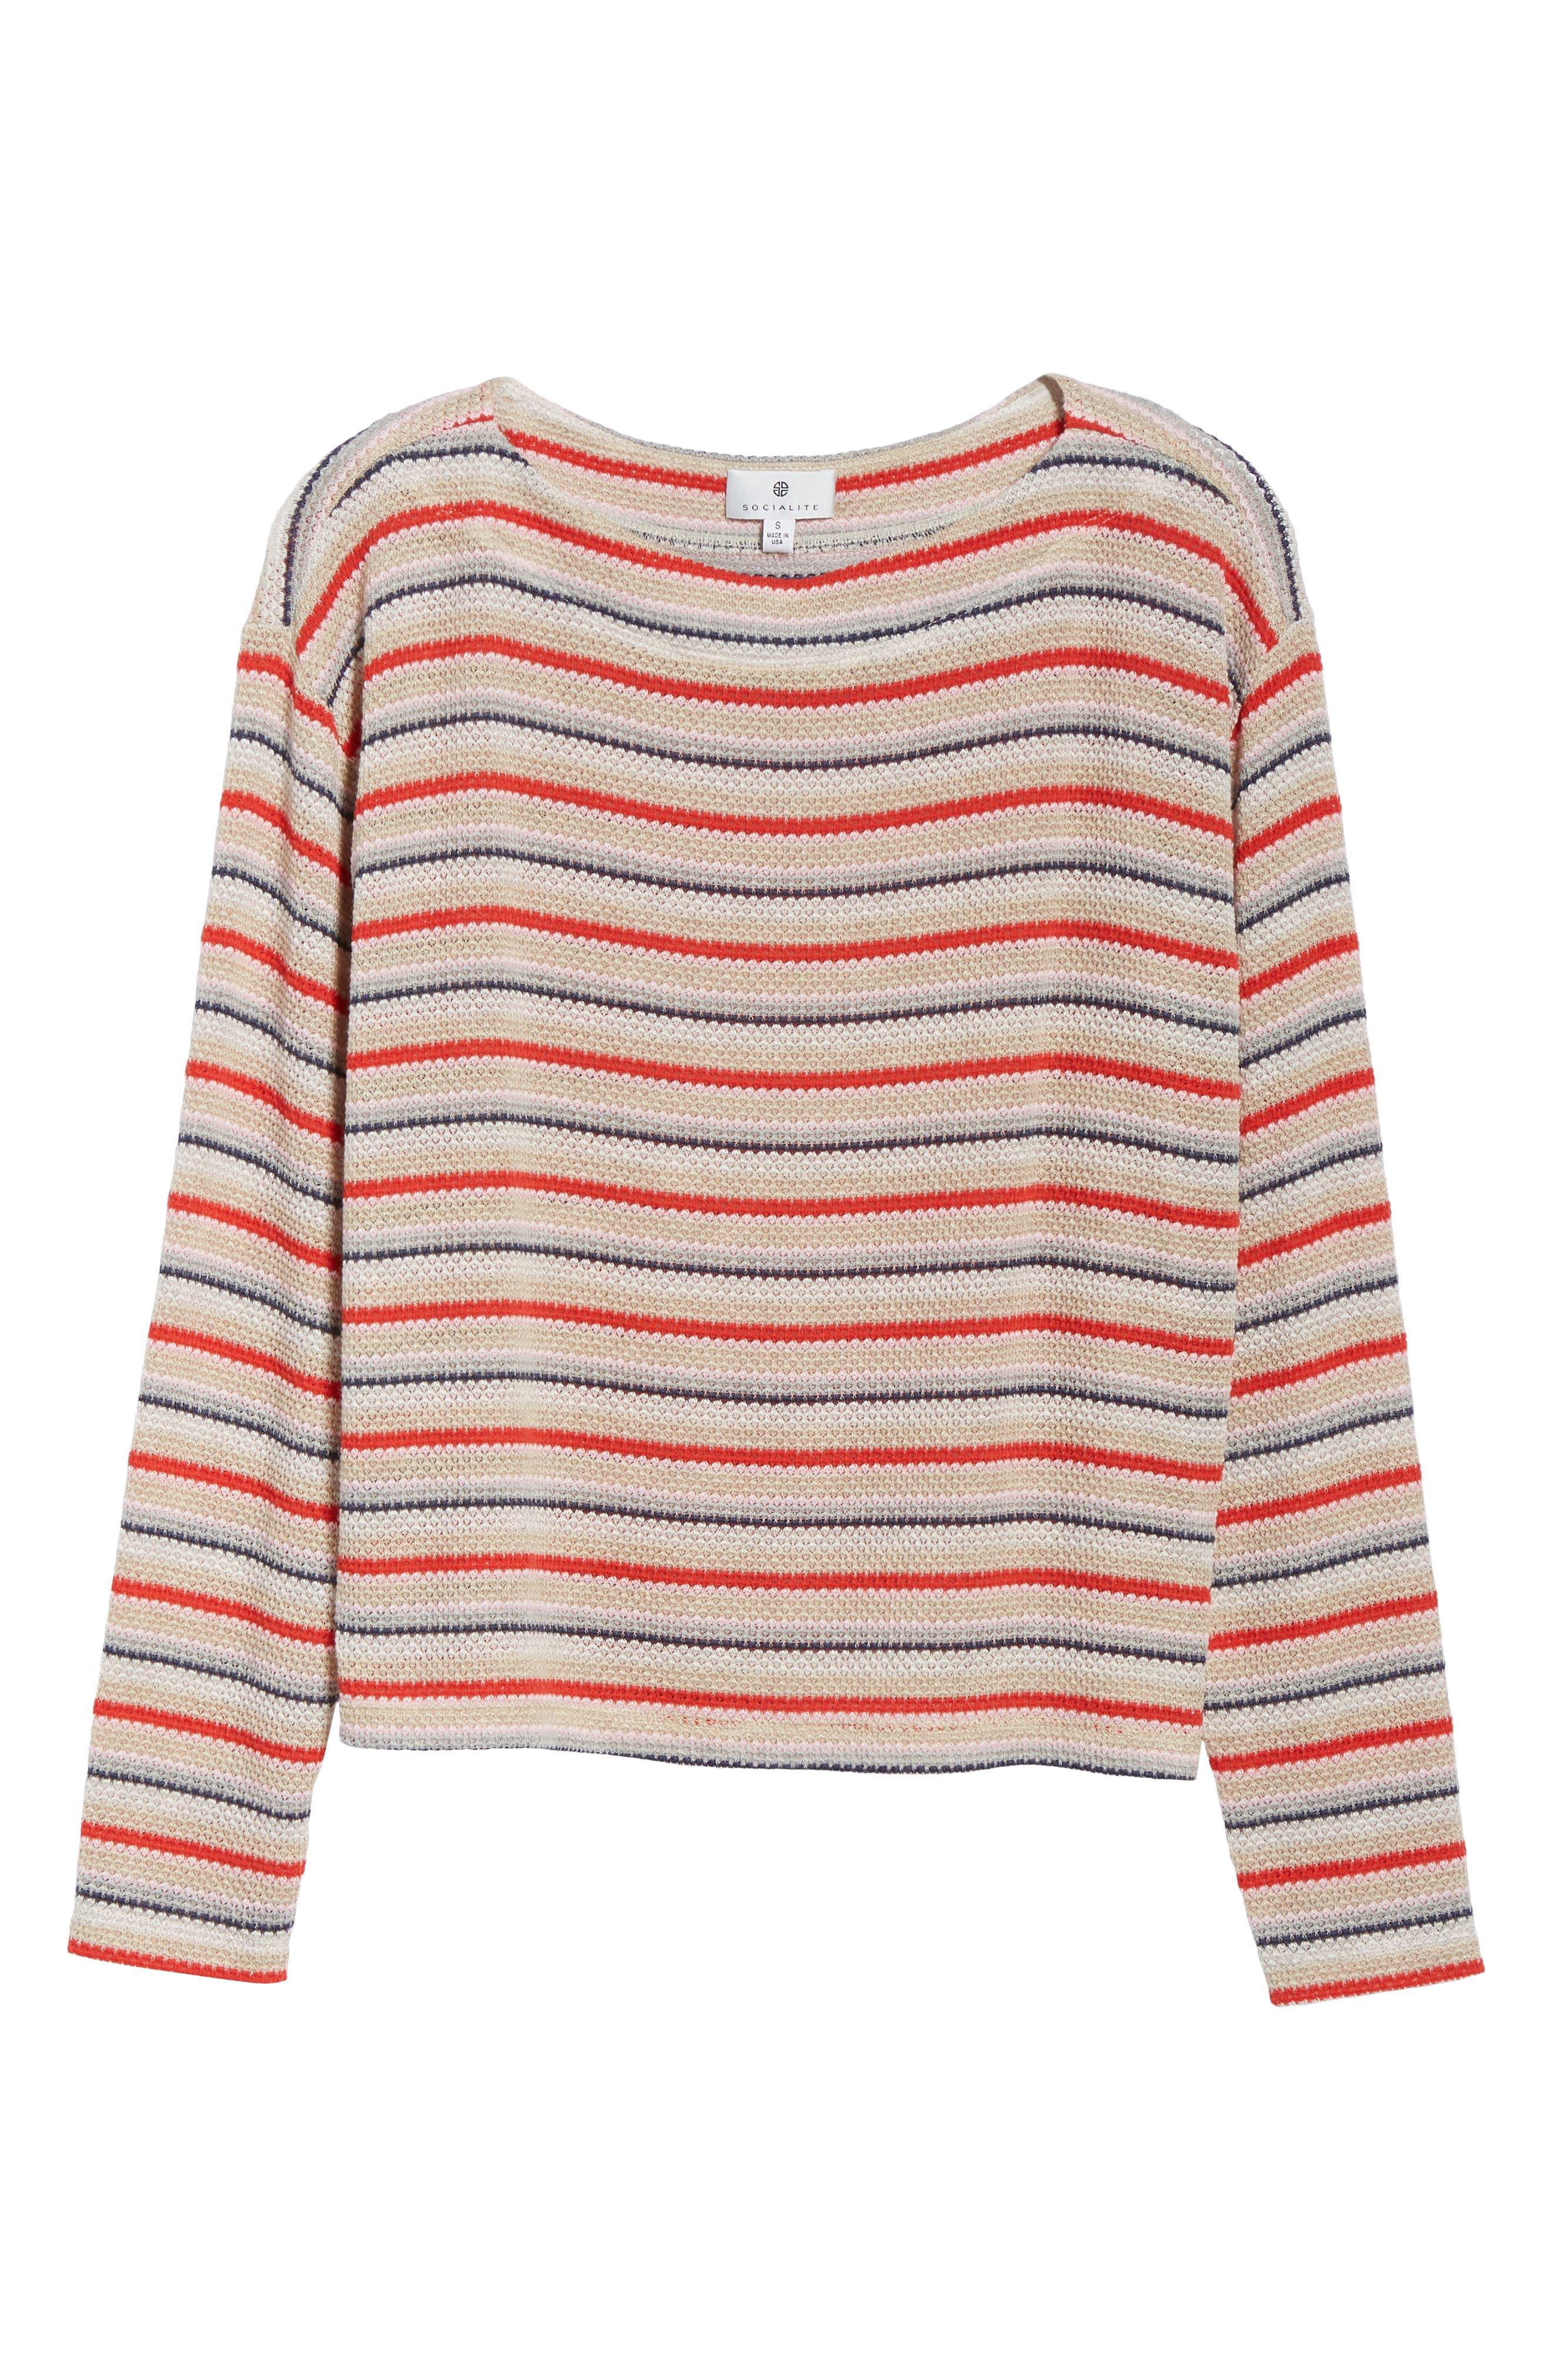 Stripe Knit Tee,                             Alternate thumbnail 6, color,                             RAINBOW